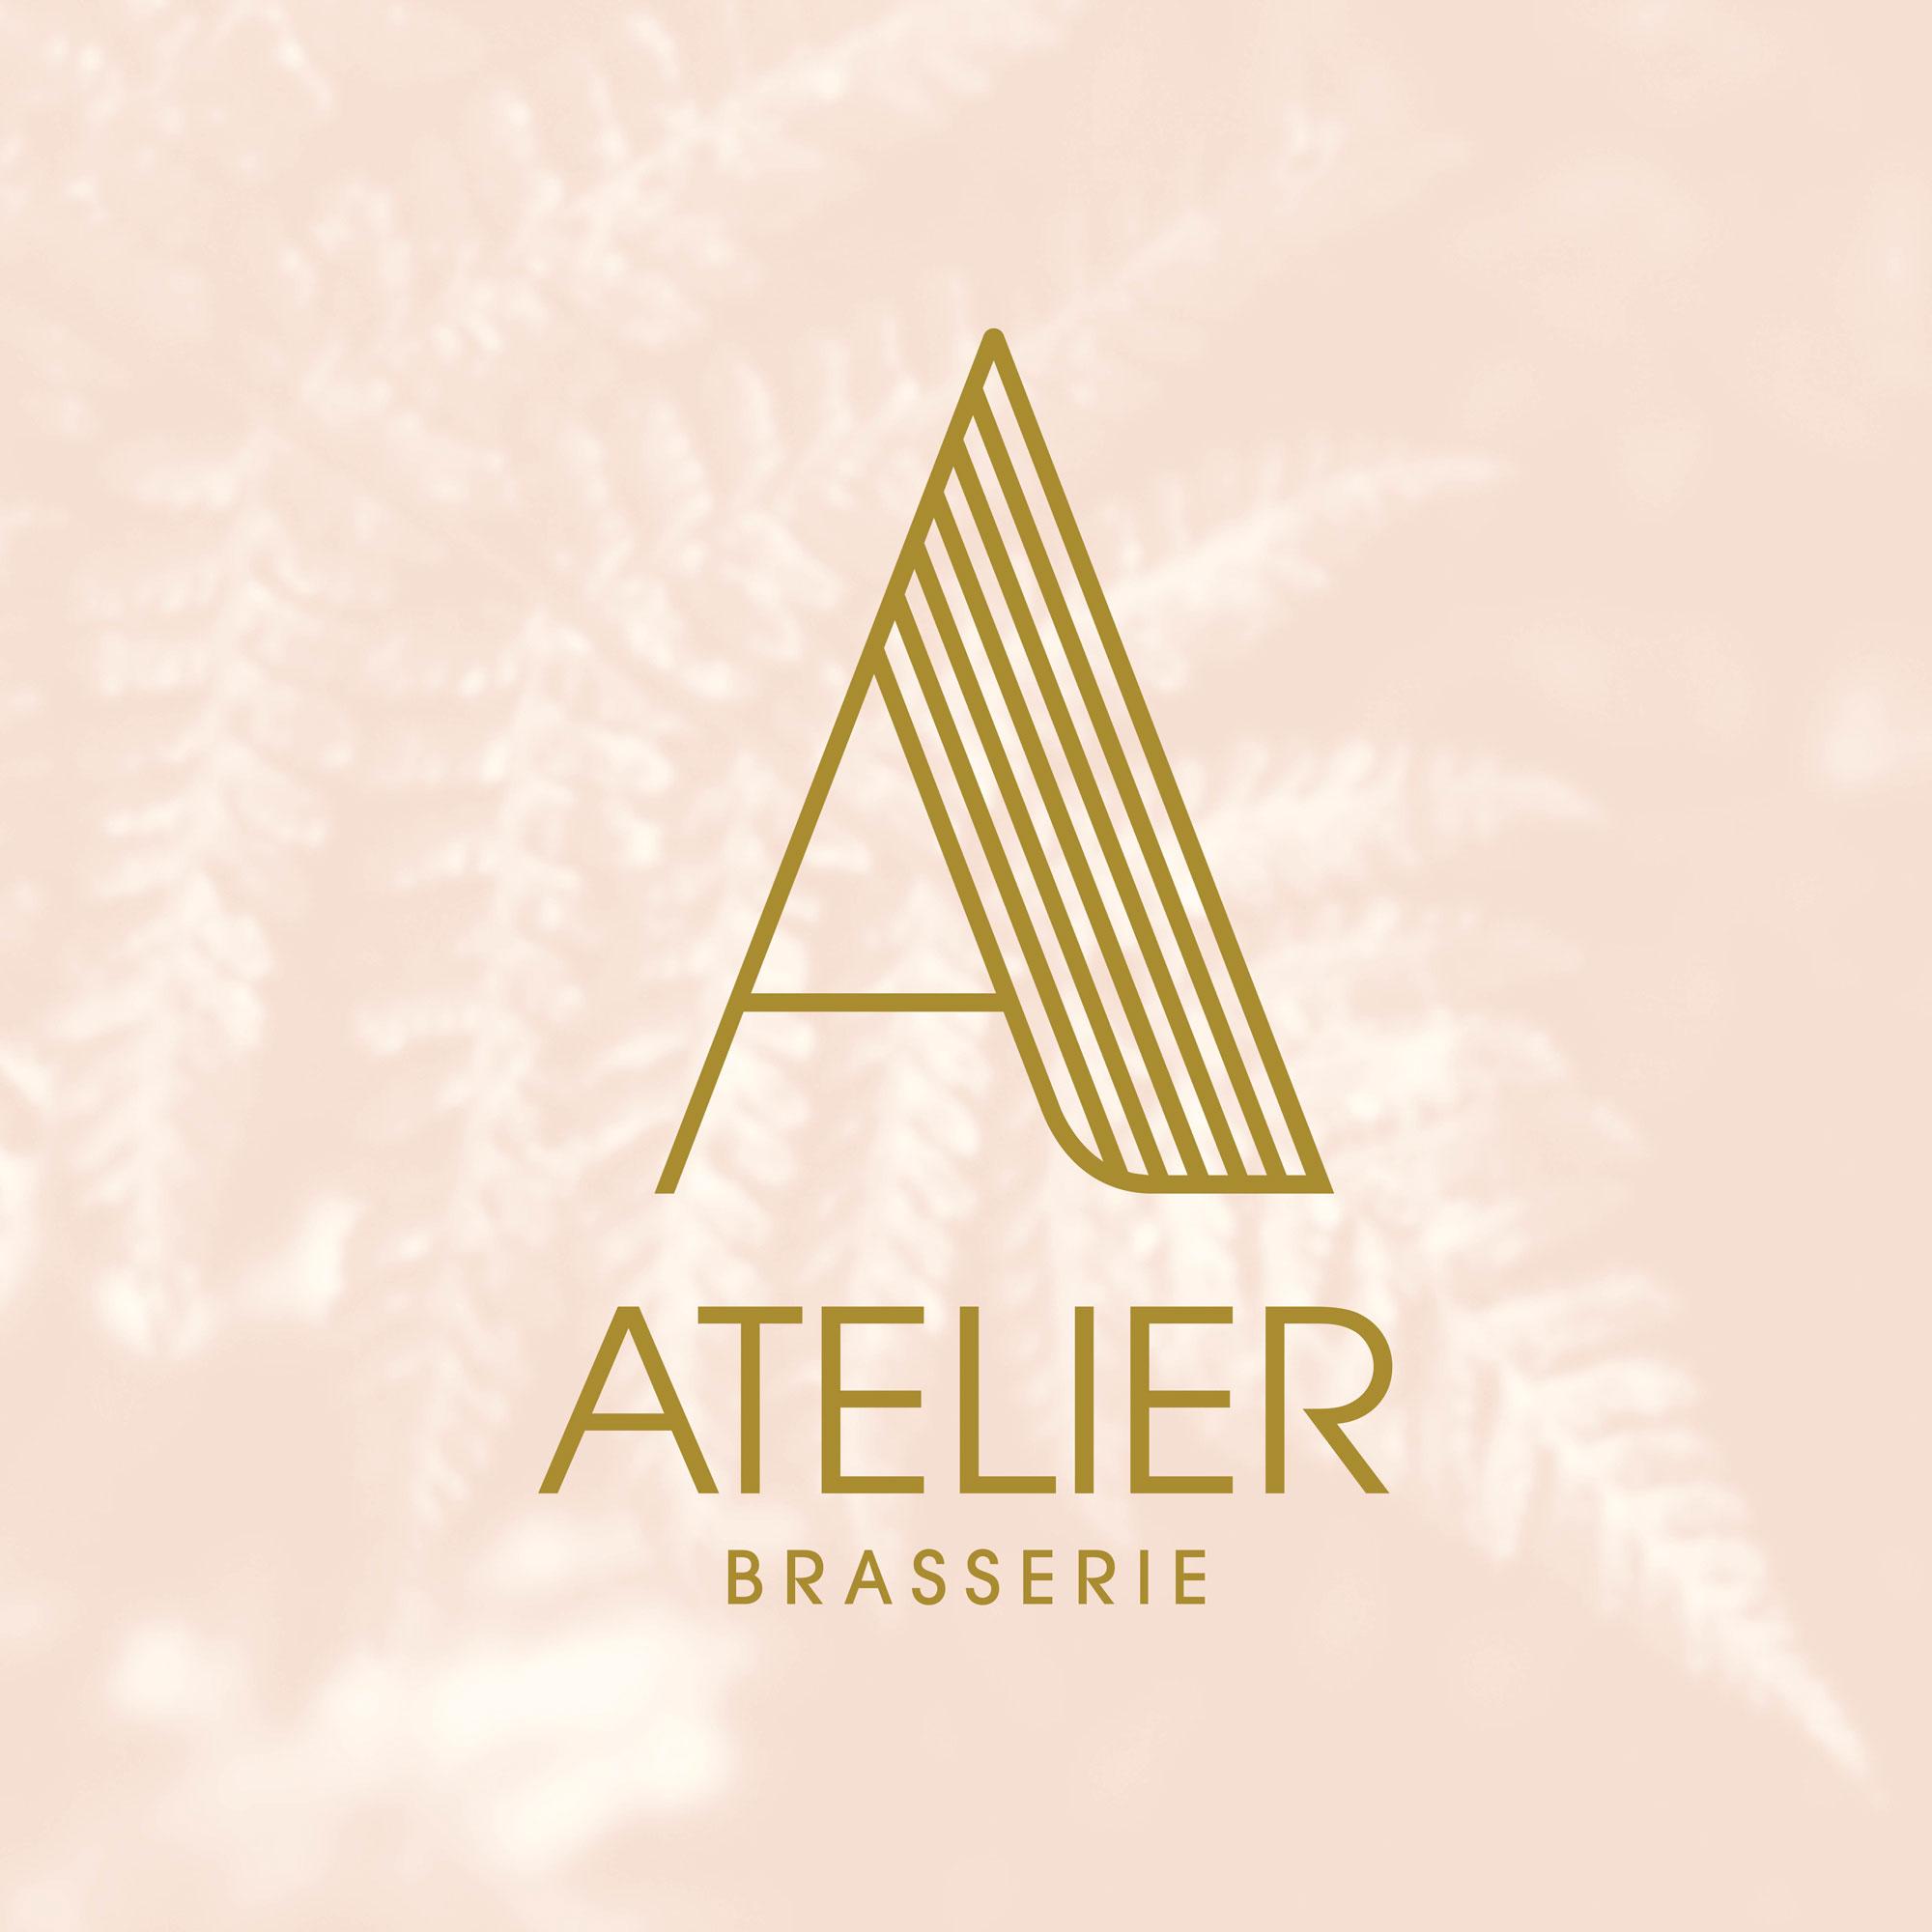 AtelierBrasserieStackedLogoBG.jpg